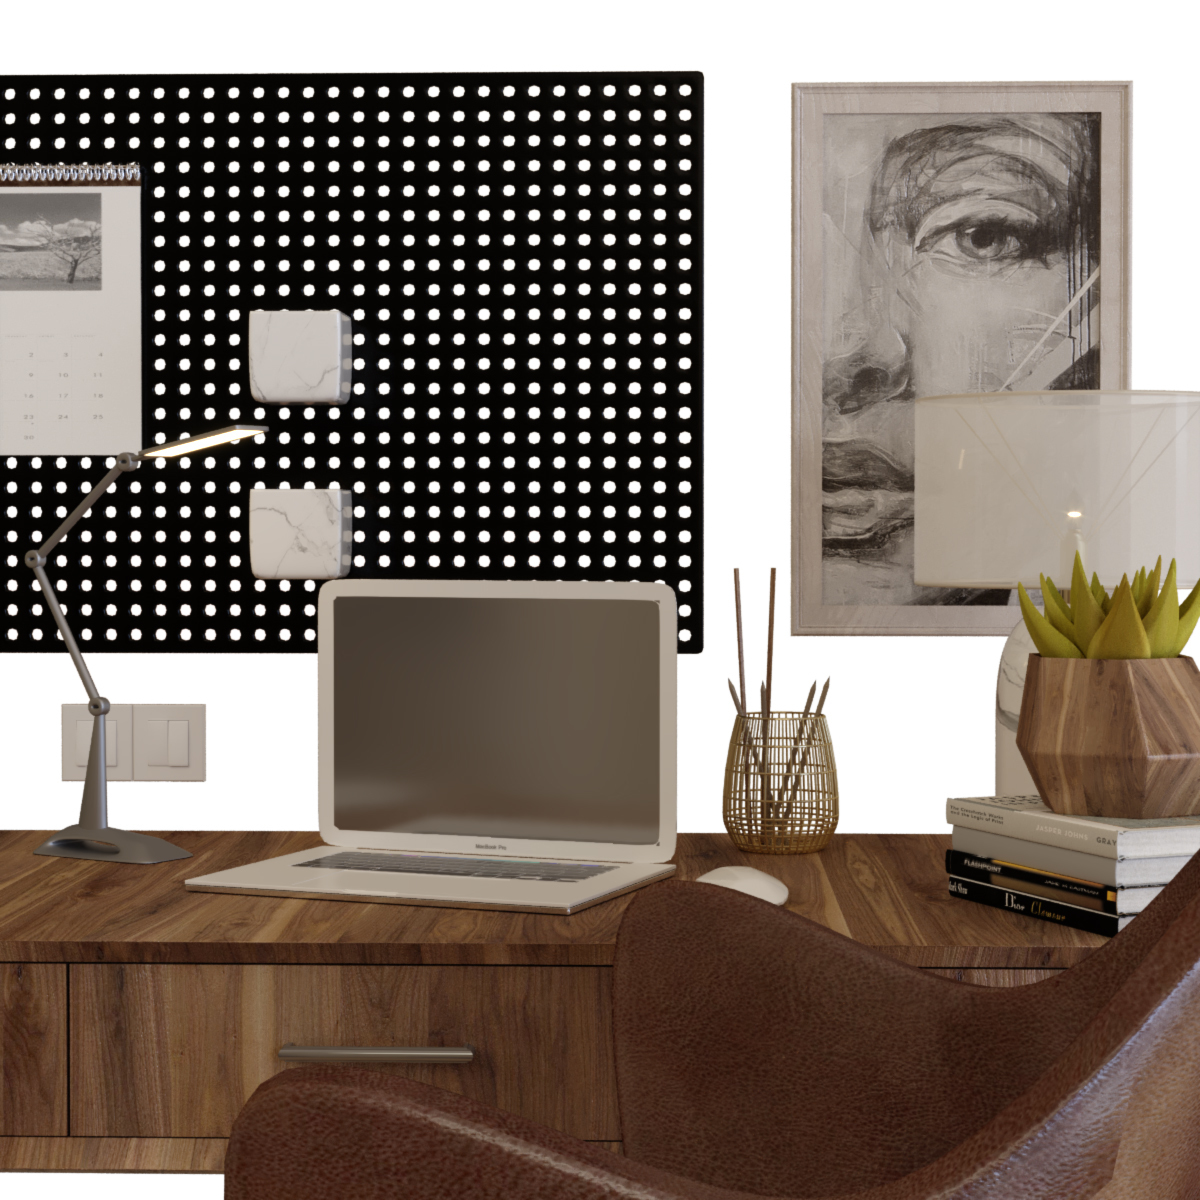 7.jpg Download STL file offfice üorkplace 3 • Design to 3D print, unisjamavari